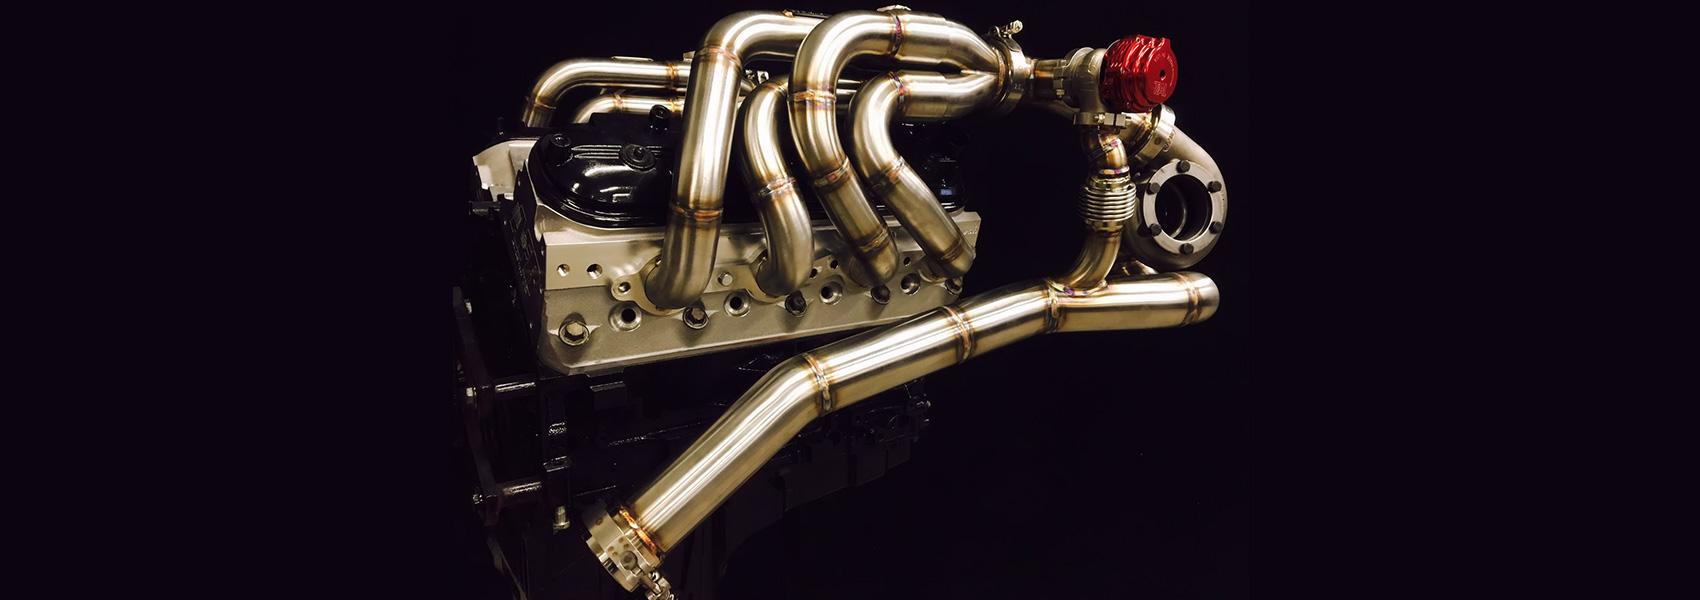 Stainless Steel LS Turbo System - GP Headers - Barnesville, MN